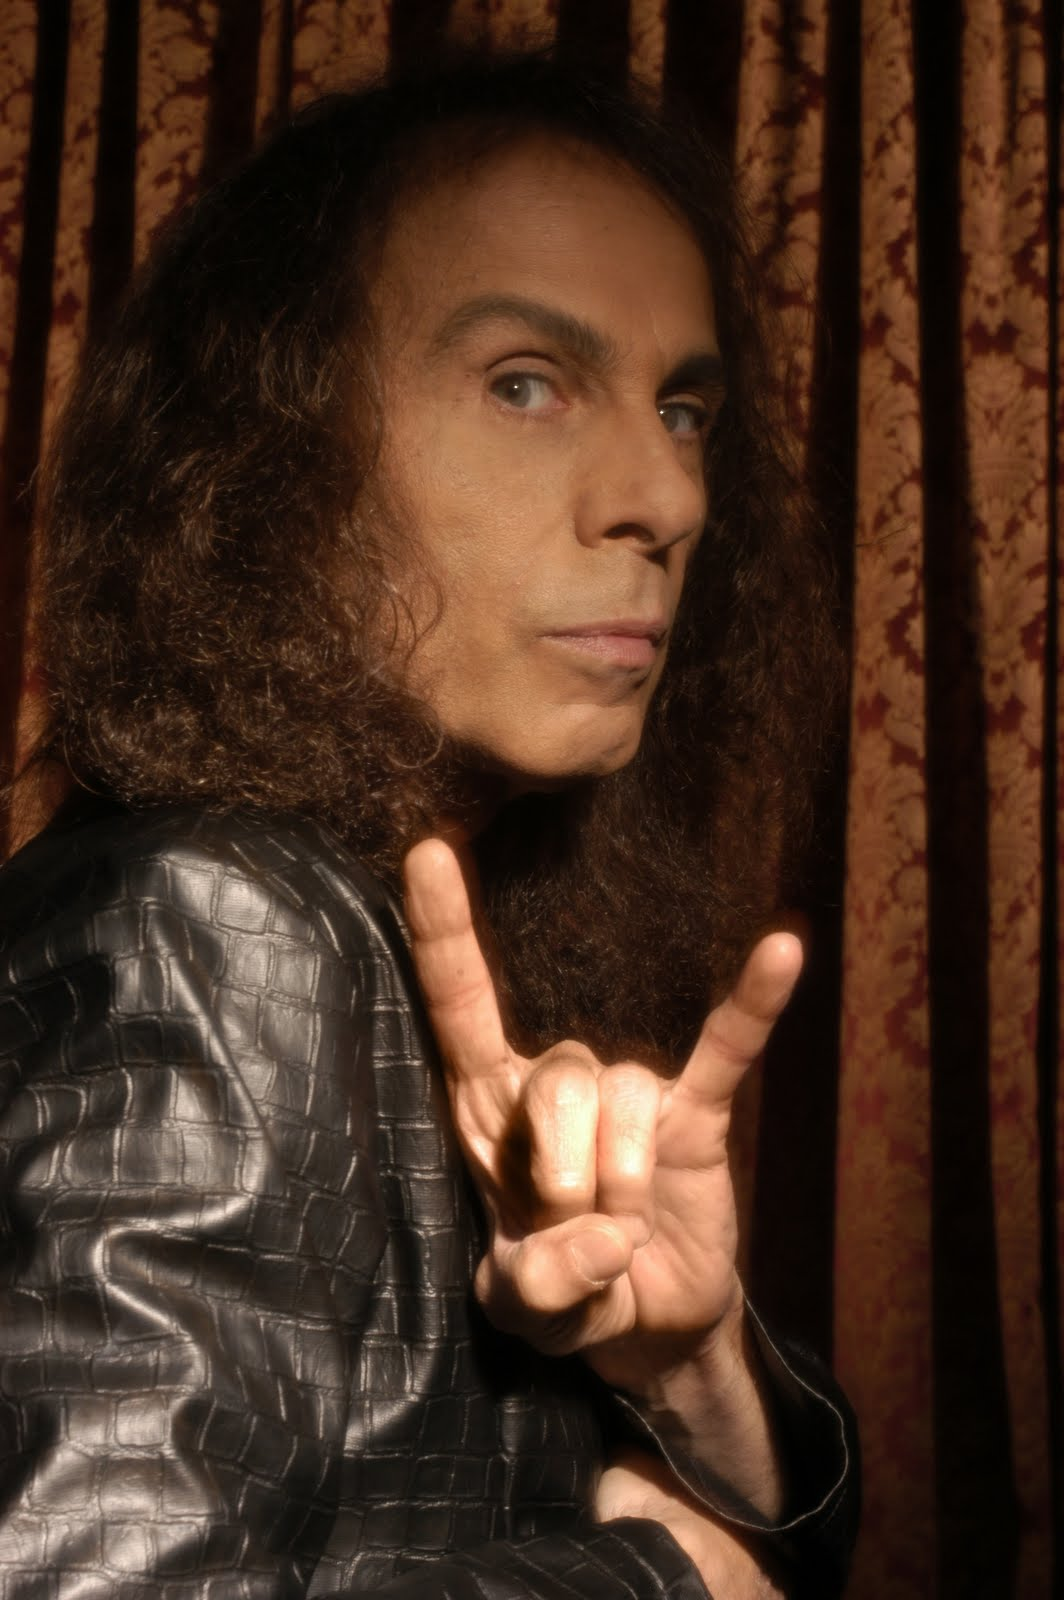 Ronnie James Dio ha fallecido esta tarde | Tanaka Music